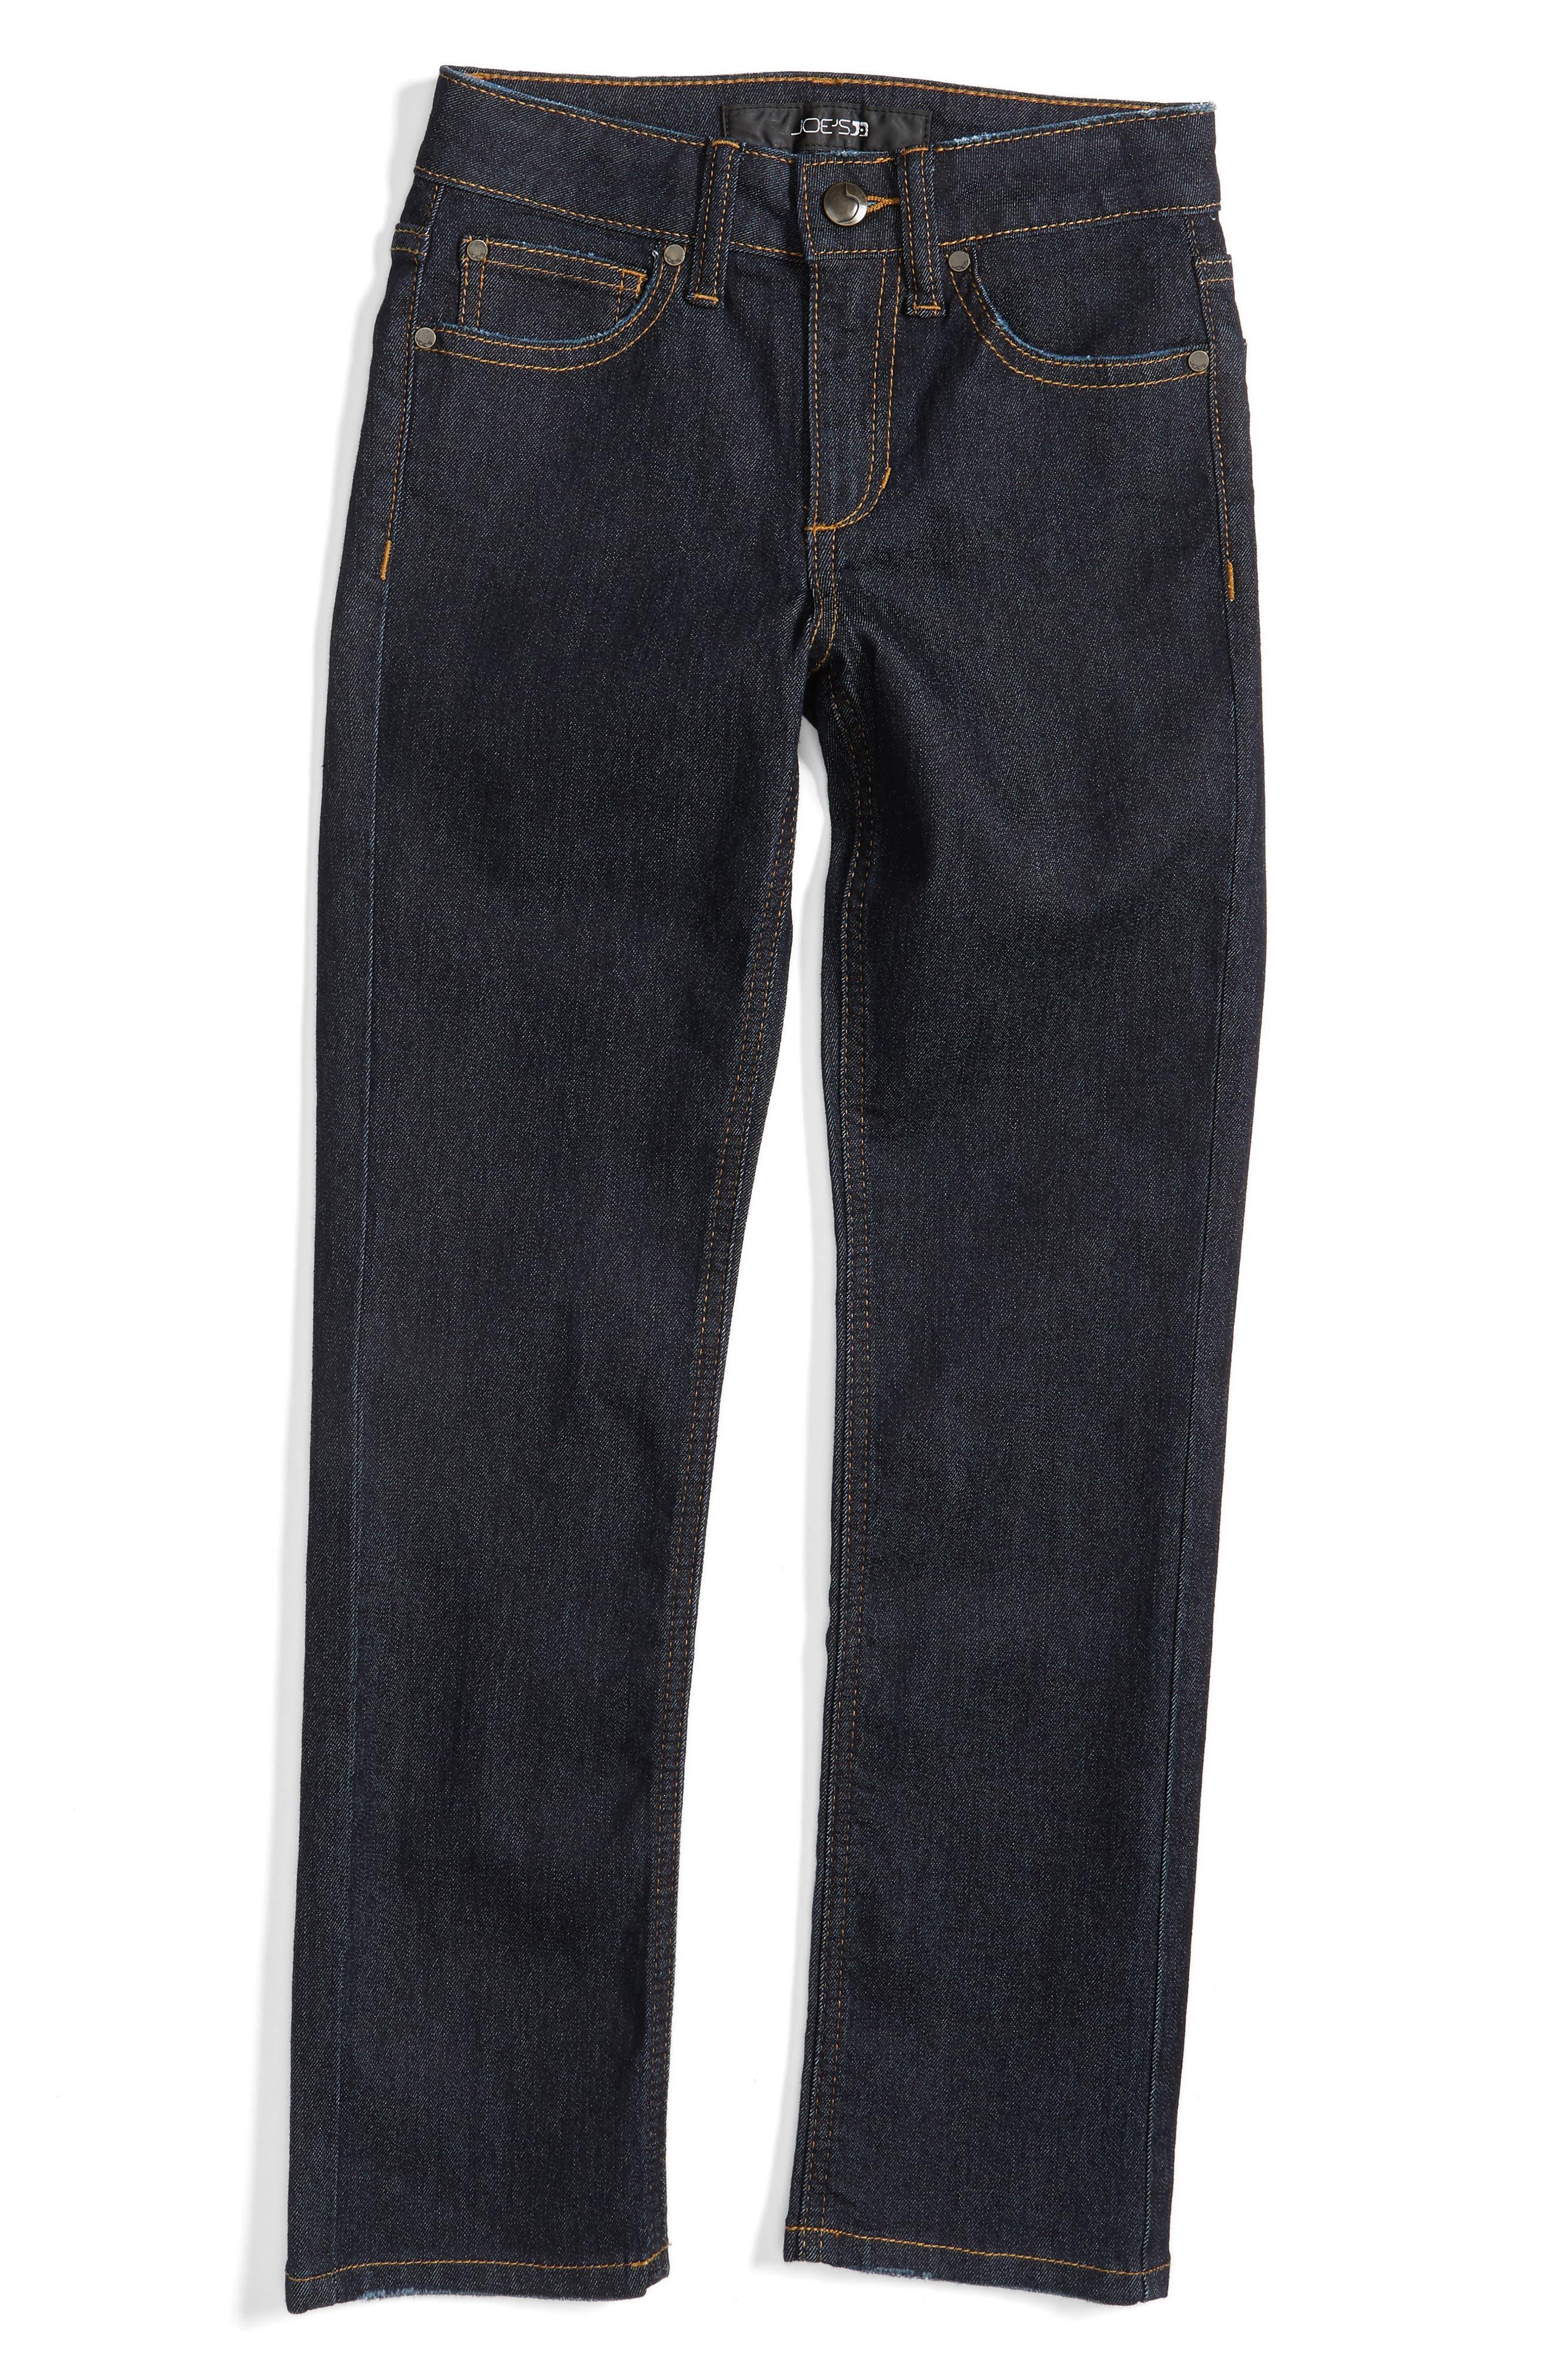 Brixton Straight Leg Jeans,                             Alternate thumbnail 2, color,